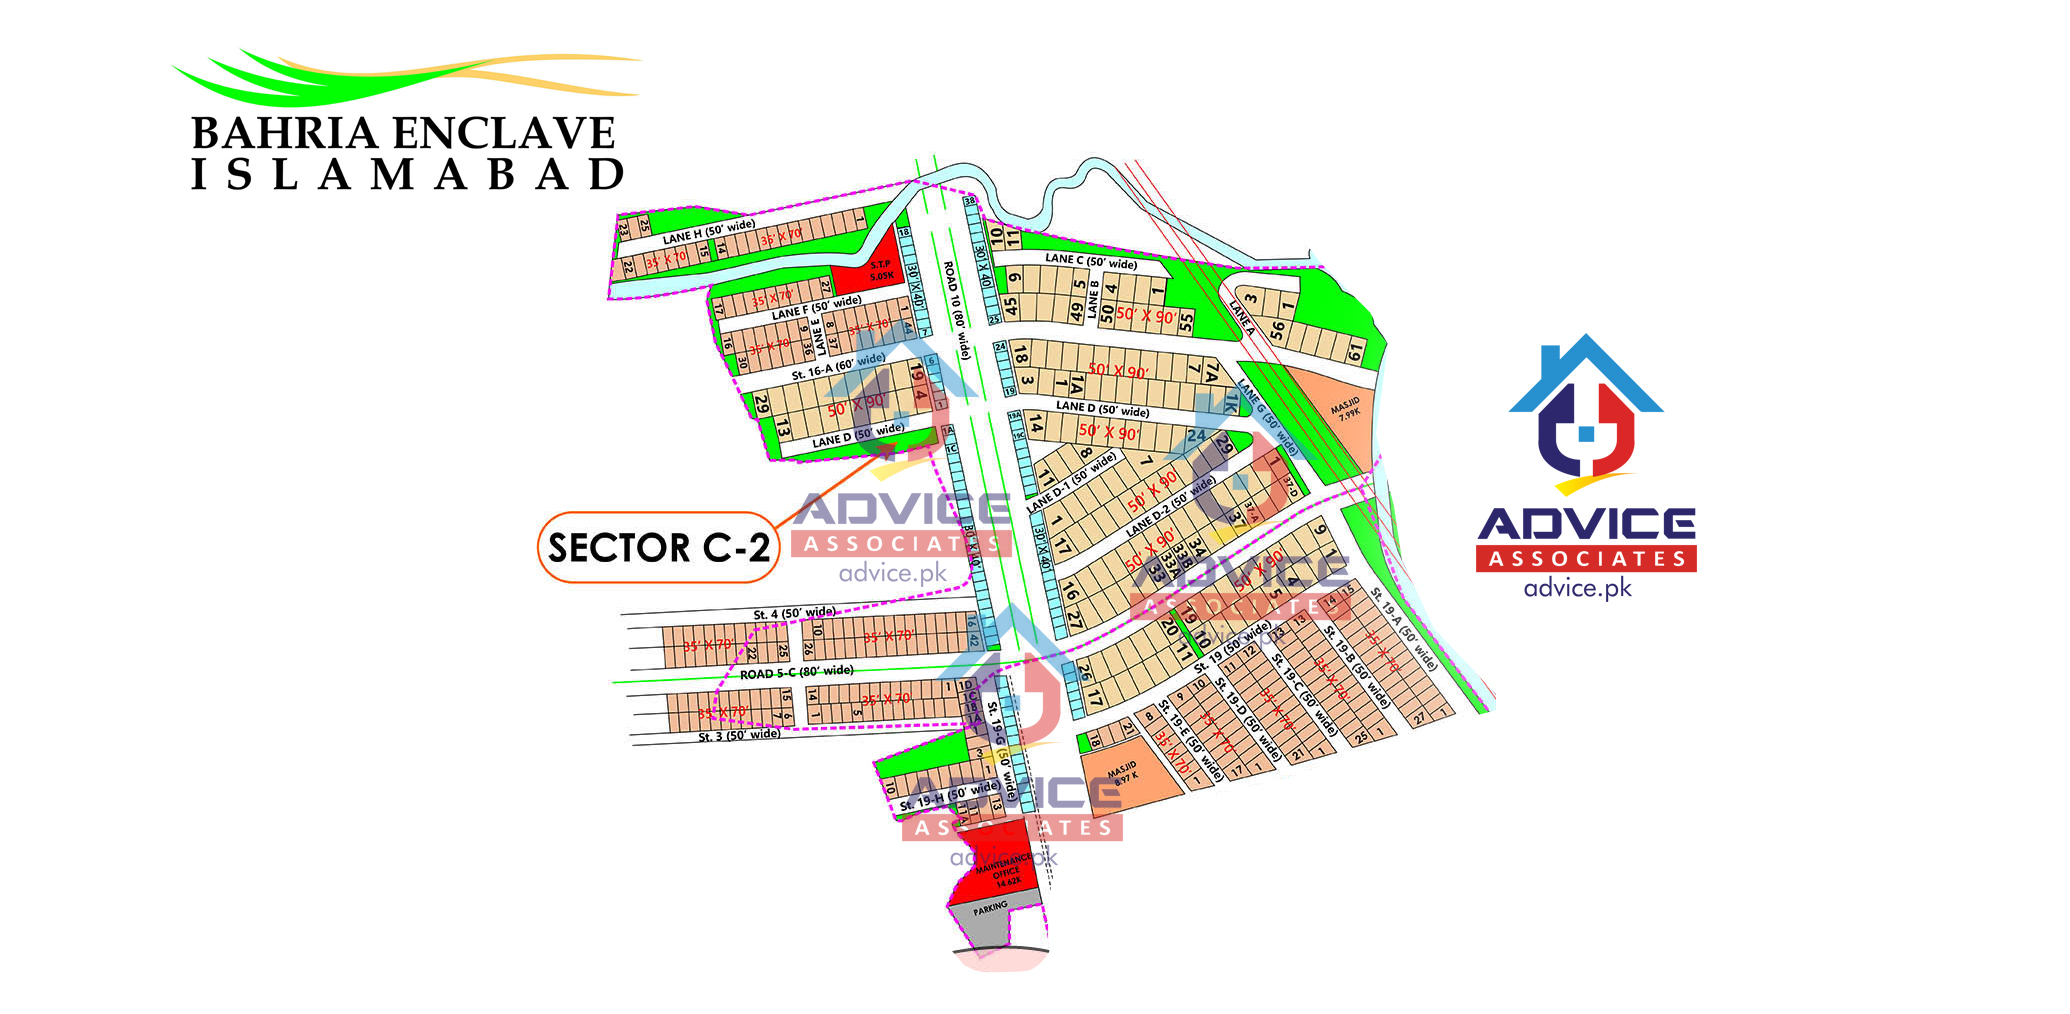 Bahria Enclave Sector C3 Map